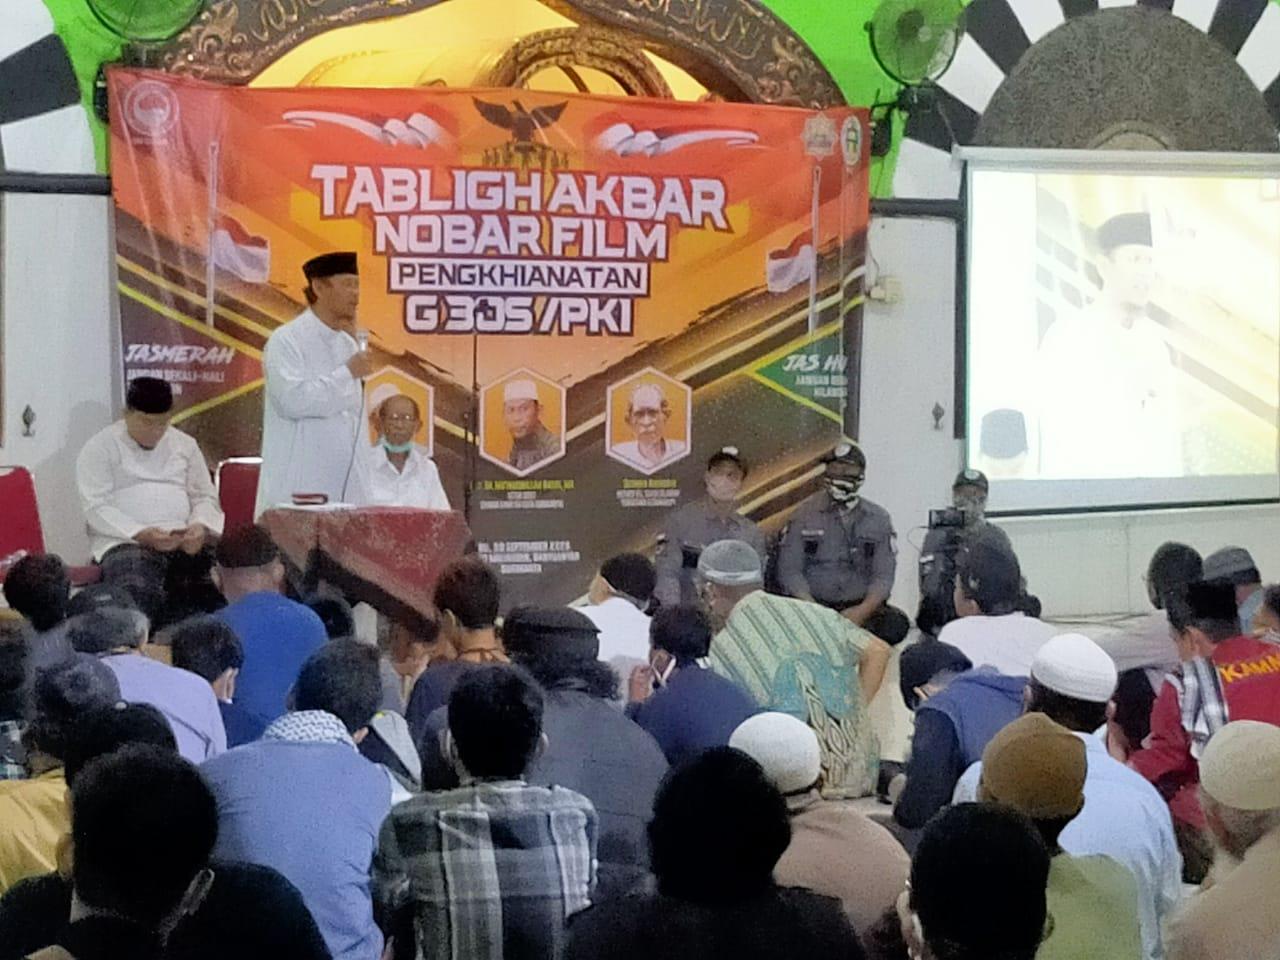 DSKS Gelar Tabligh Akbar dan Nobar Film G30S/PKI